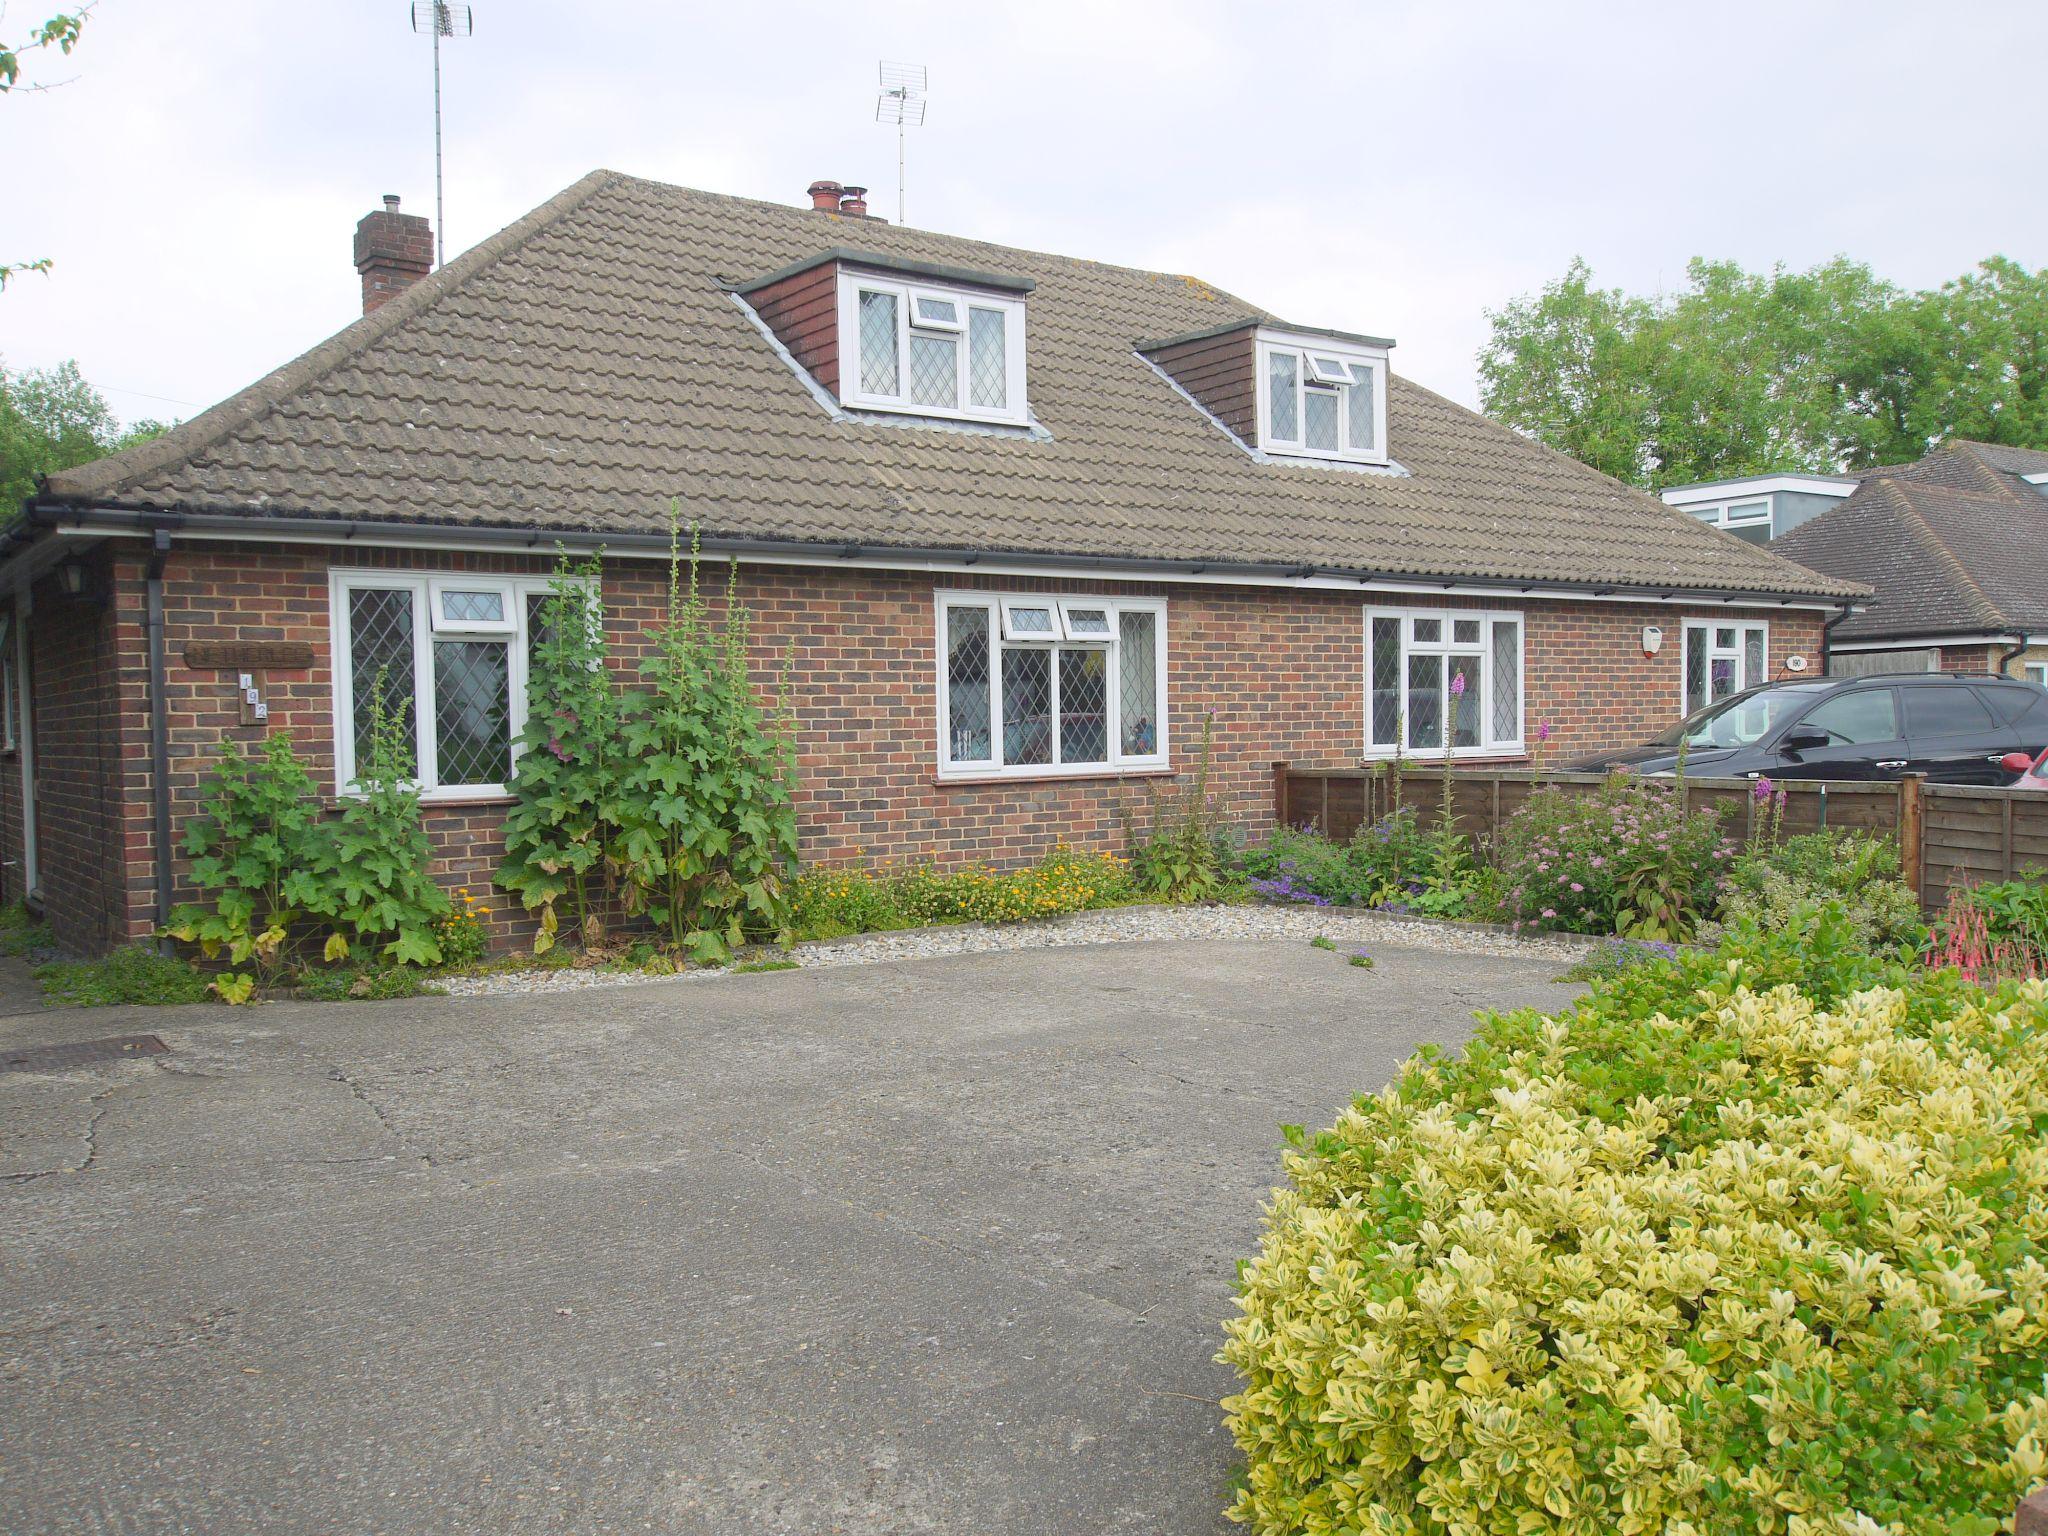 2 bedroom semi-detached bungalow Sold in Sevenoaks - Photograph 1